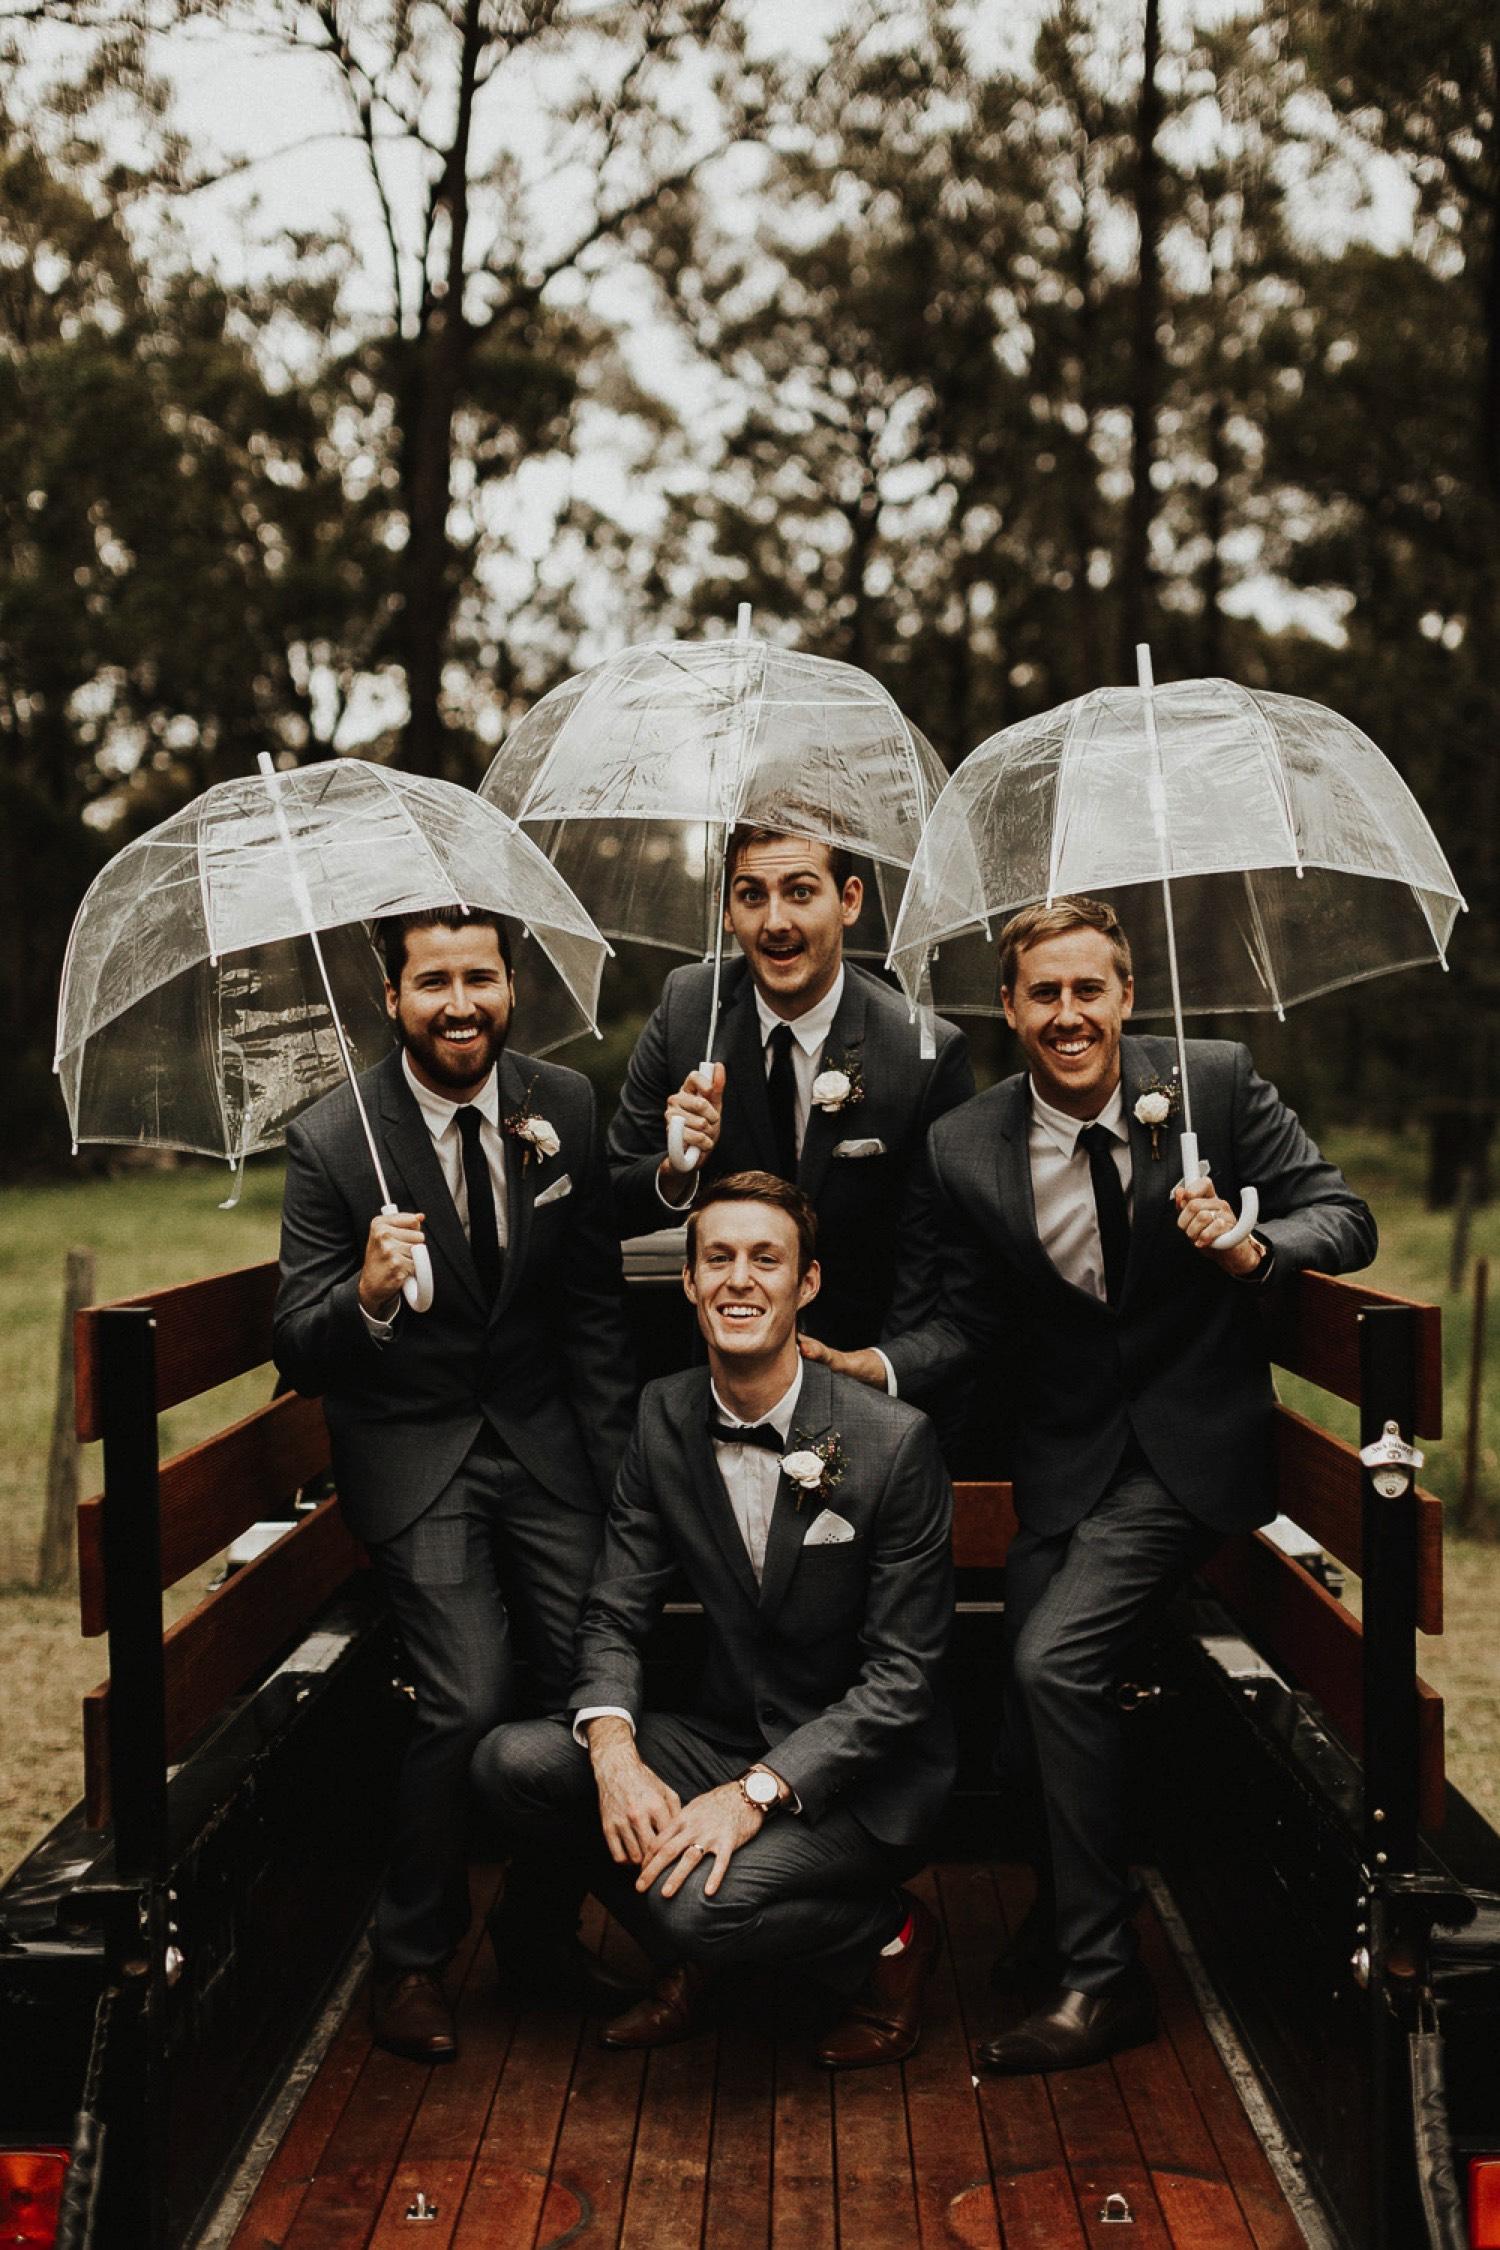 Rustic Country Wedding Photography 57.jpg